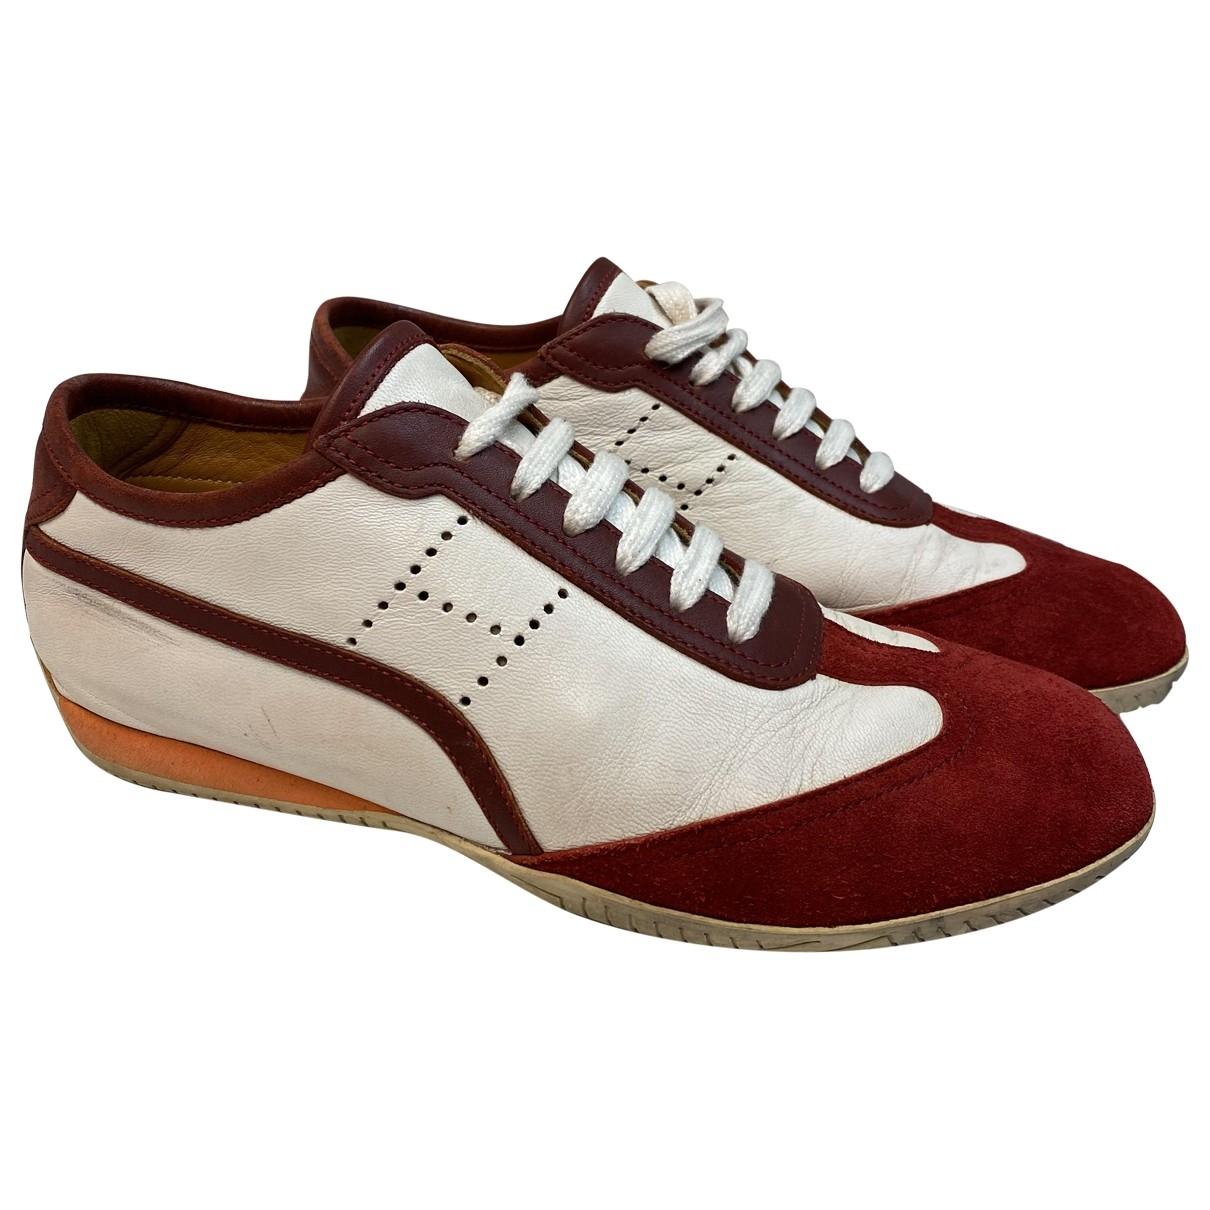 Hermès \N White Leather Trainers for Women 38 EU